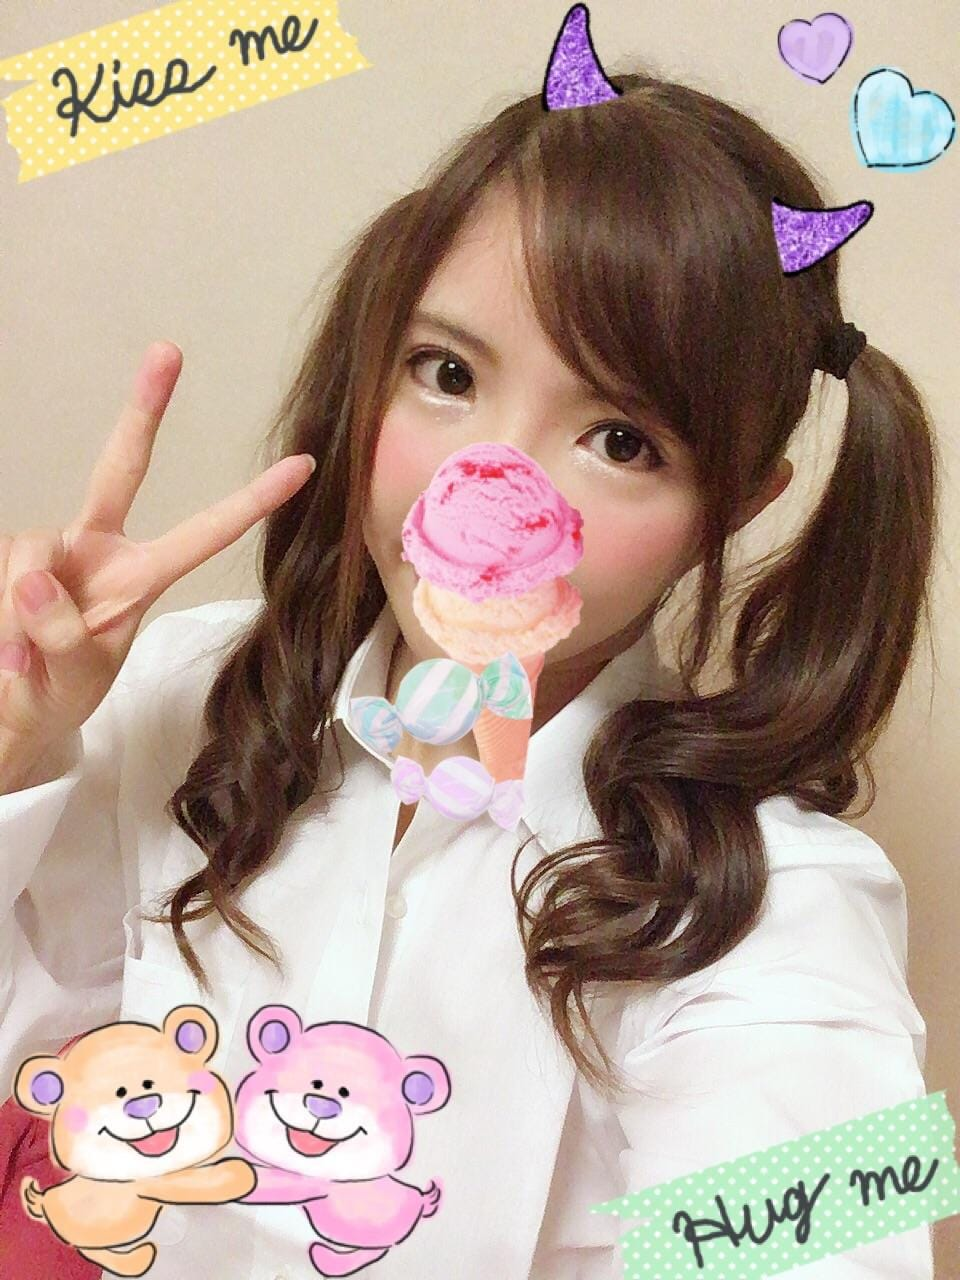 「Yシャツday♡」07/24(07/24) 13:59 | みなみの写メ・風俗動画